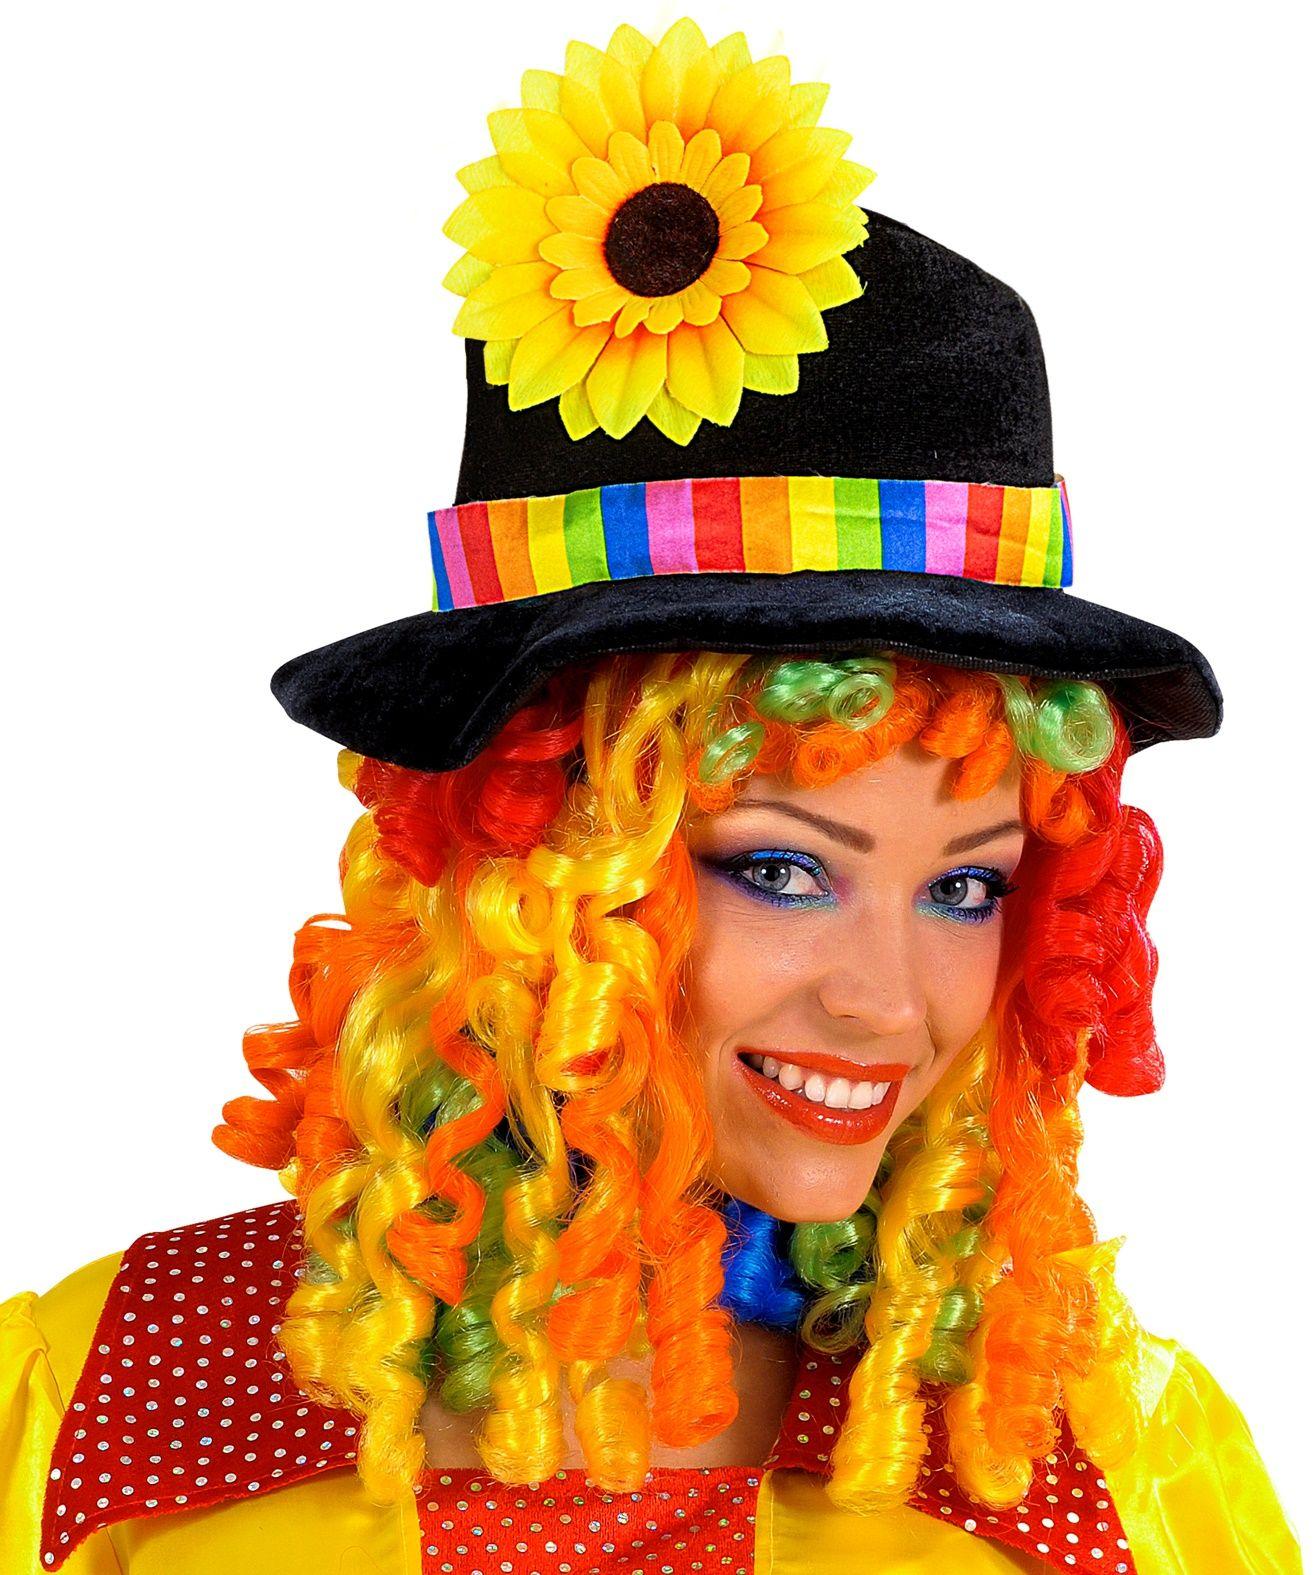 Clownshoed met zonnebloem en pruik